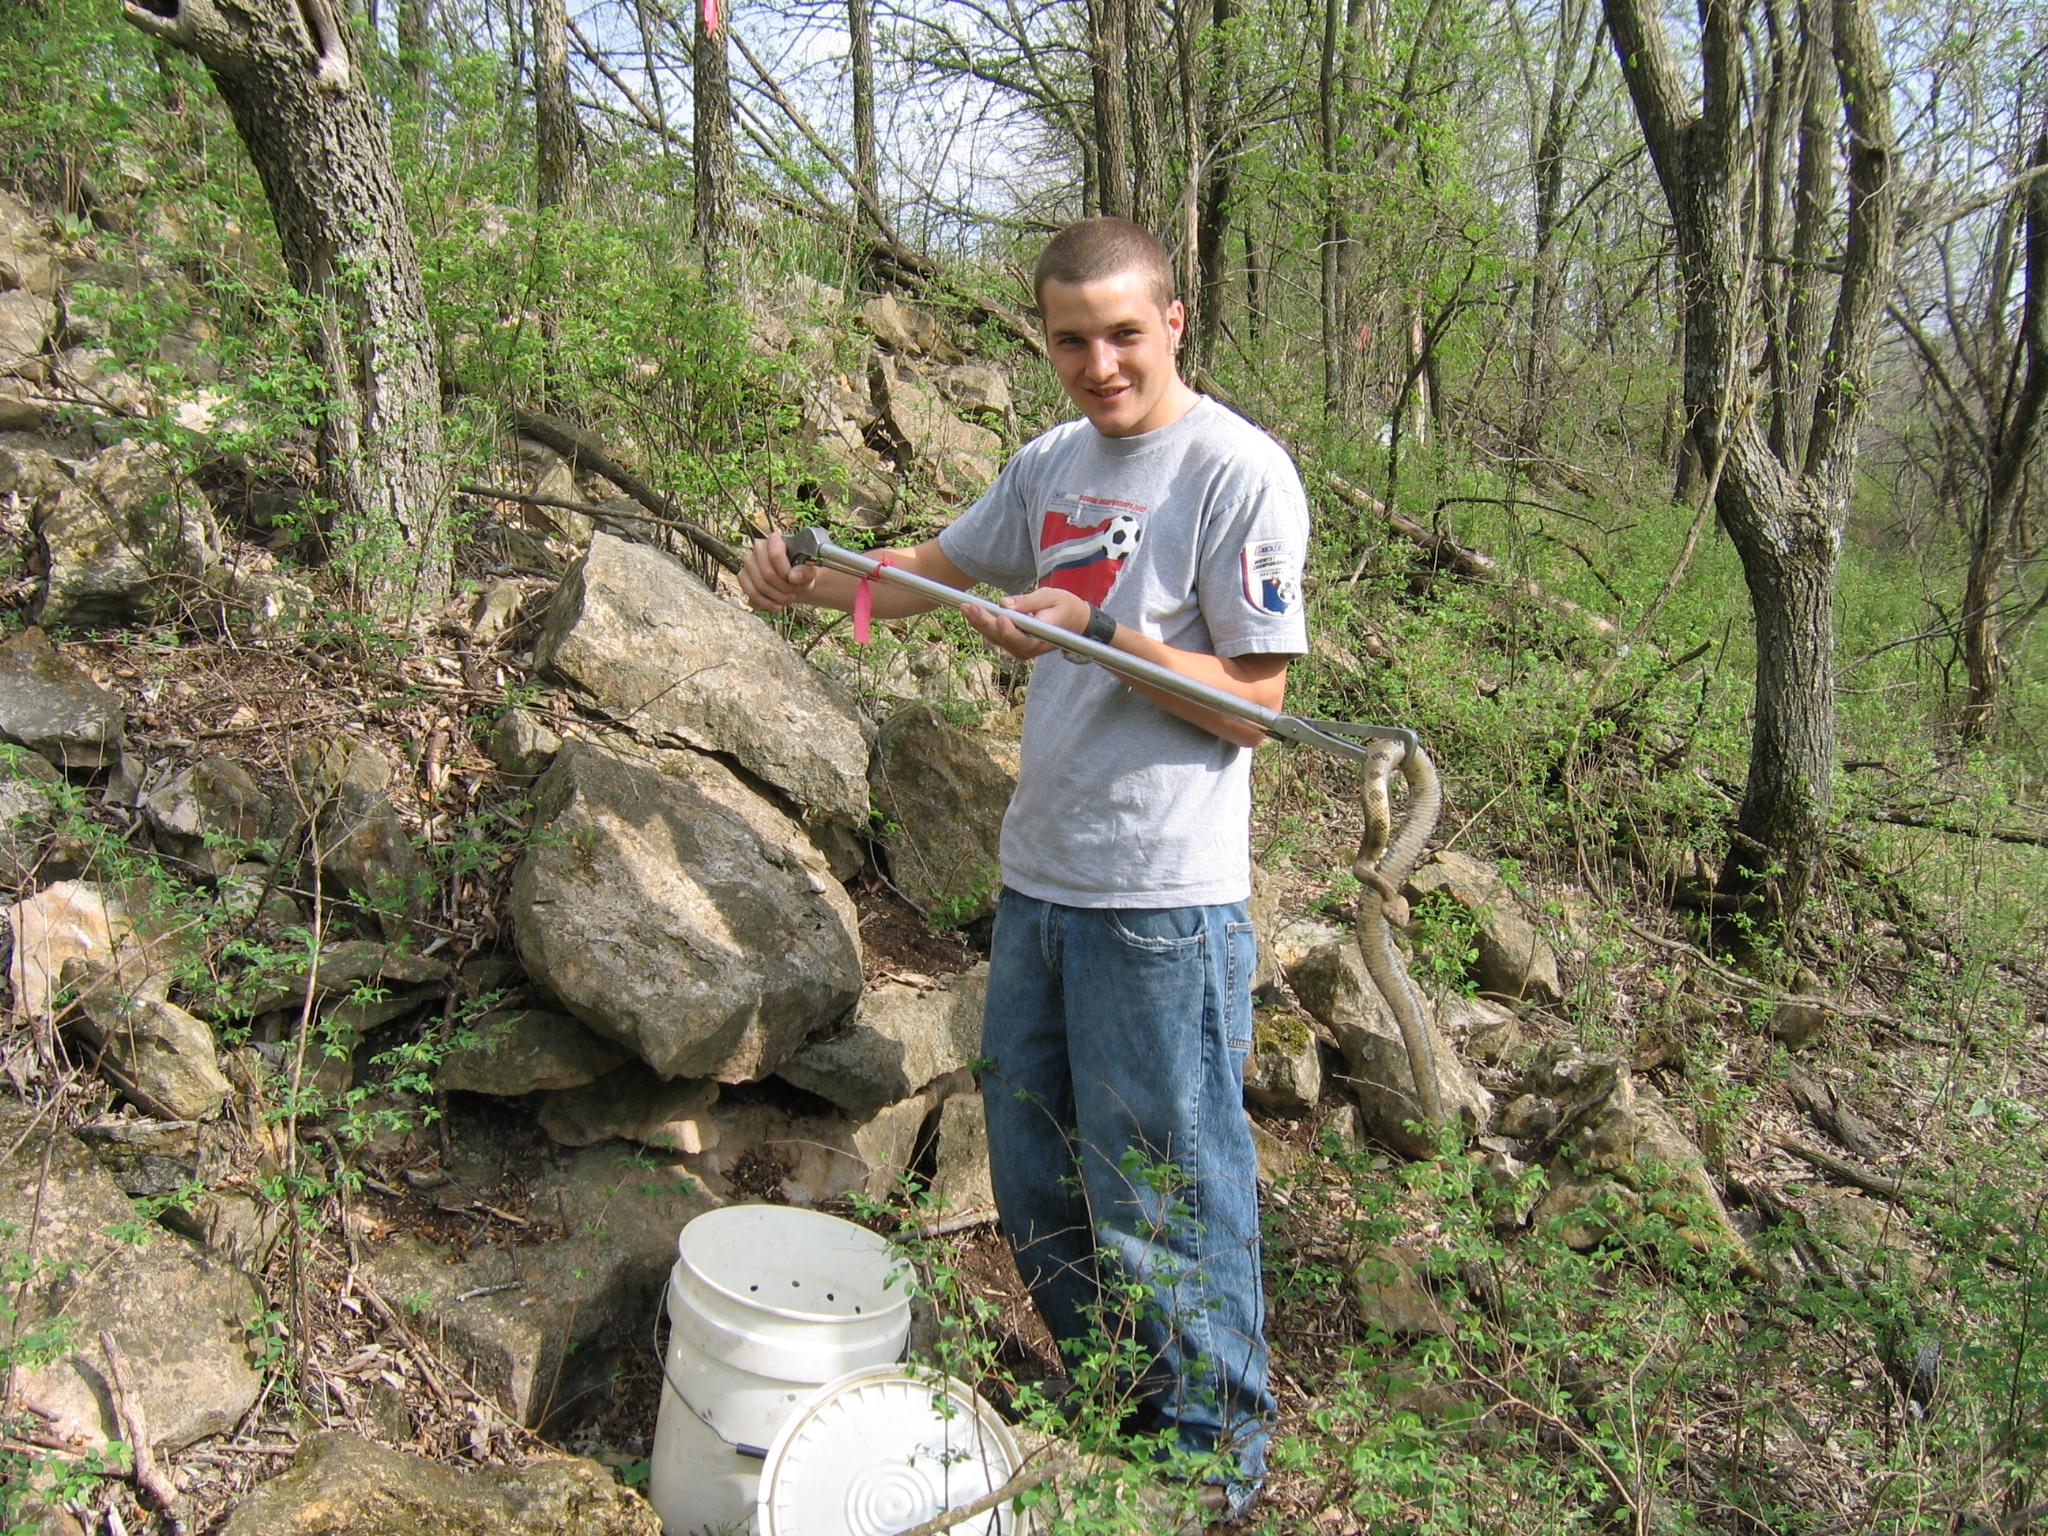 Tracking Timber Rattlesnakes back at KU (2006)